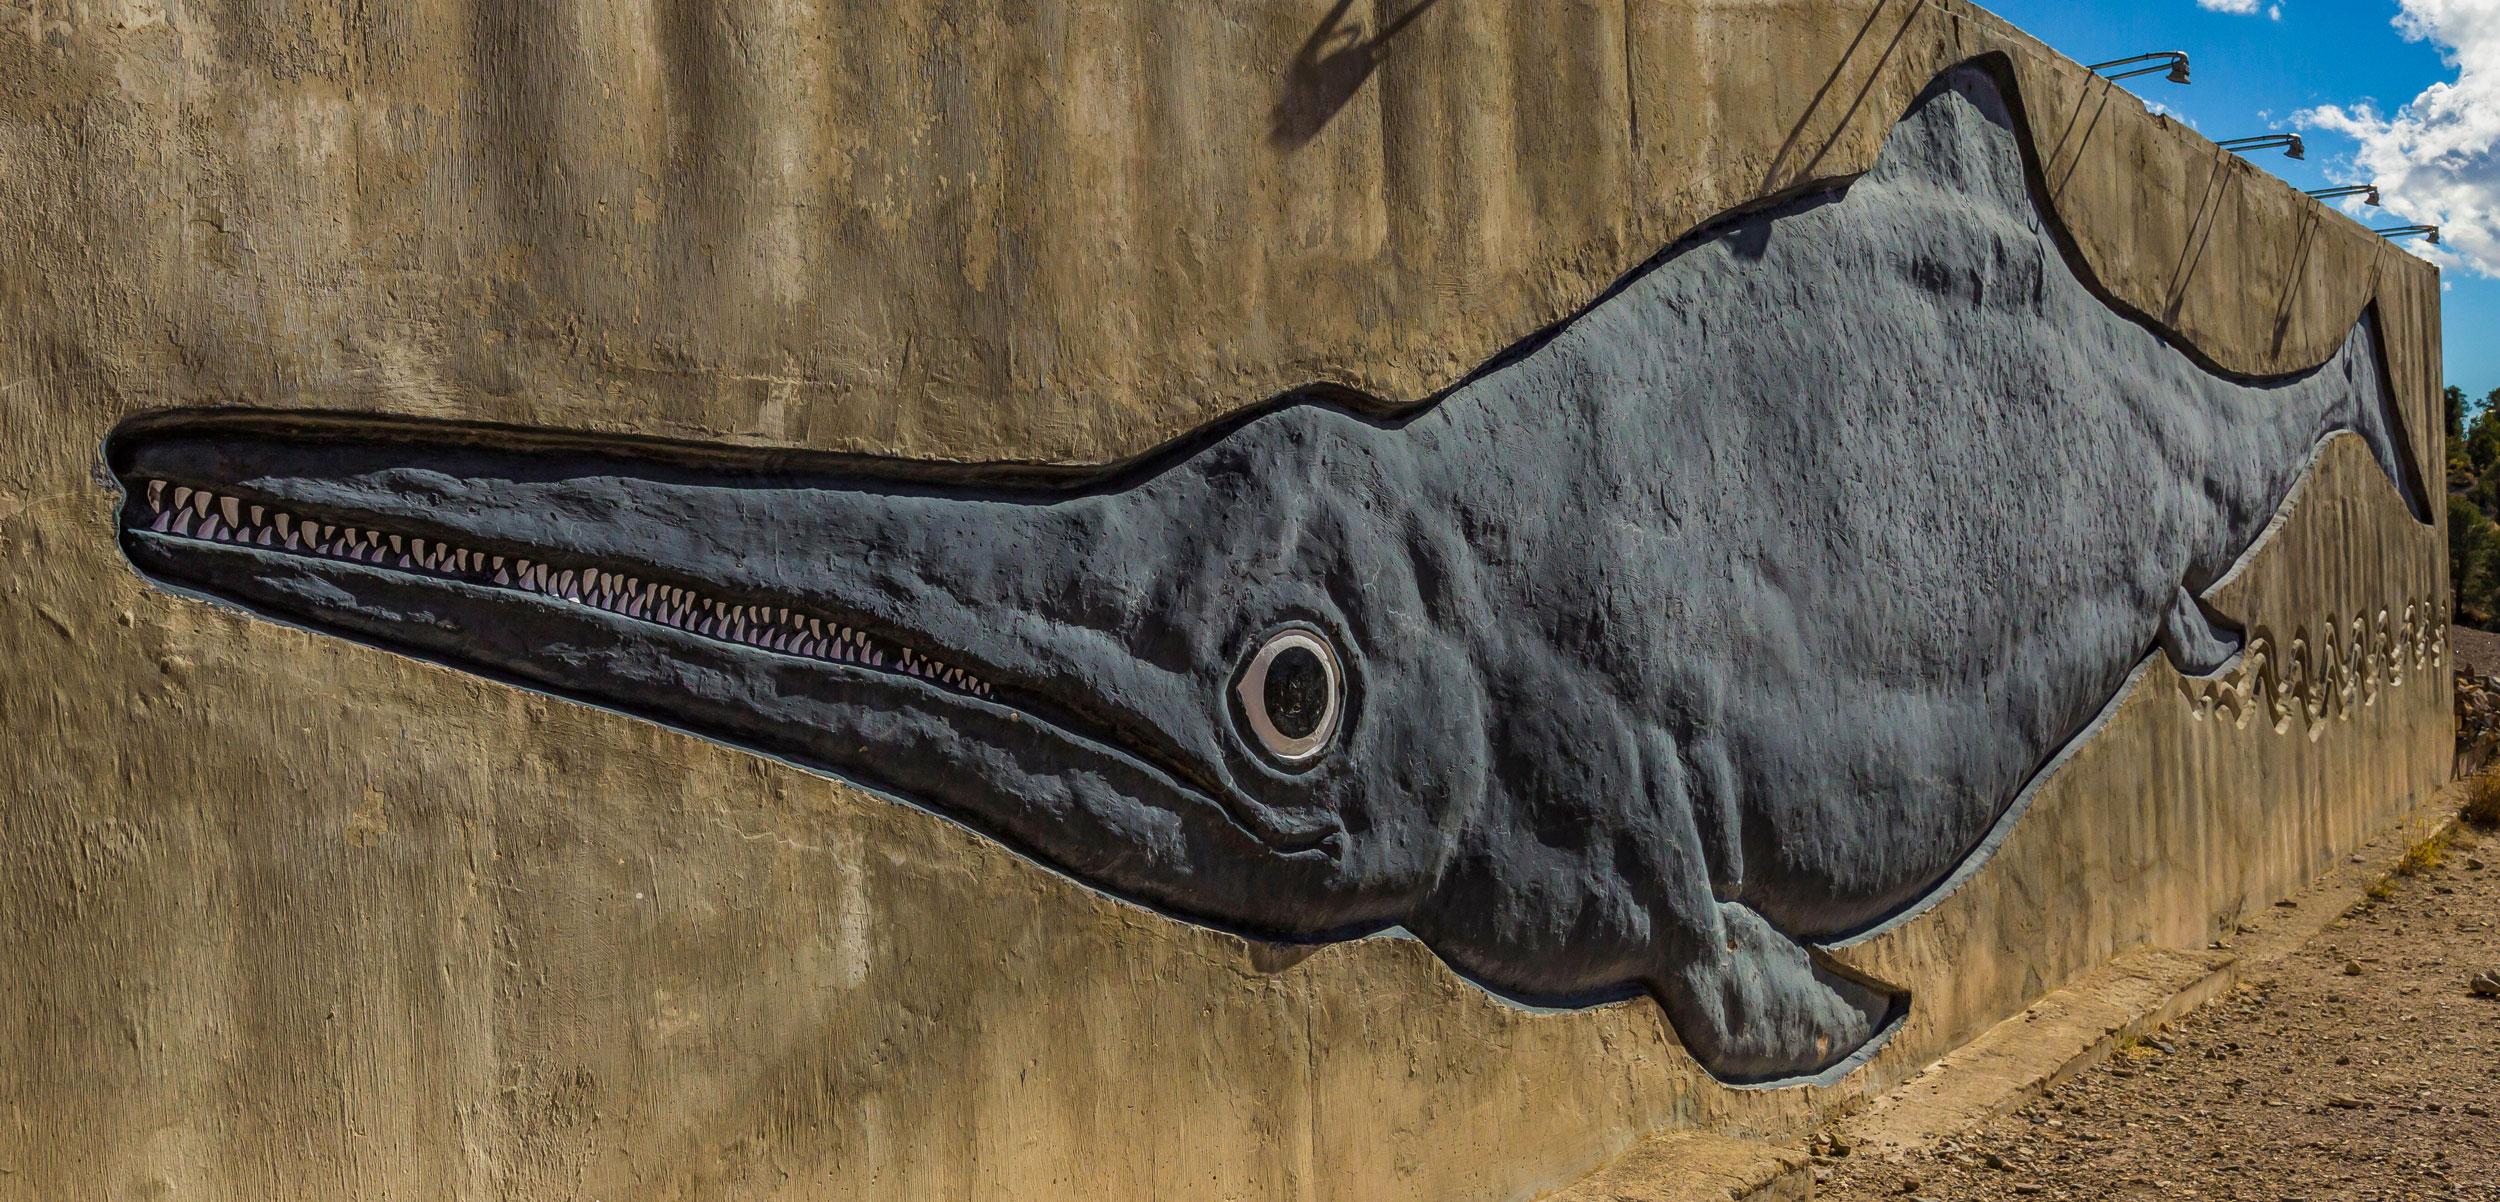 mural of Shonisaurus popularis